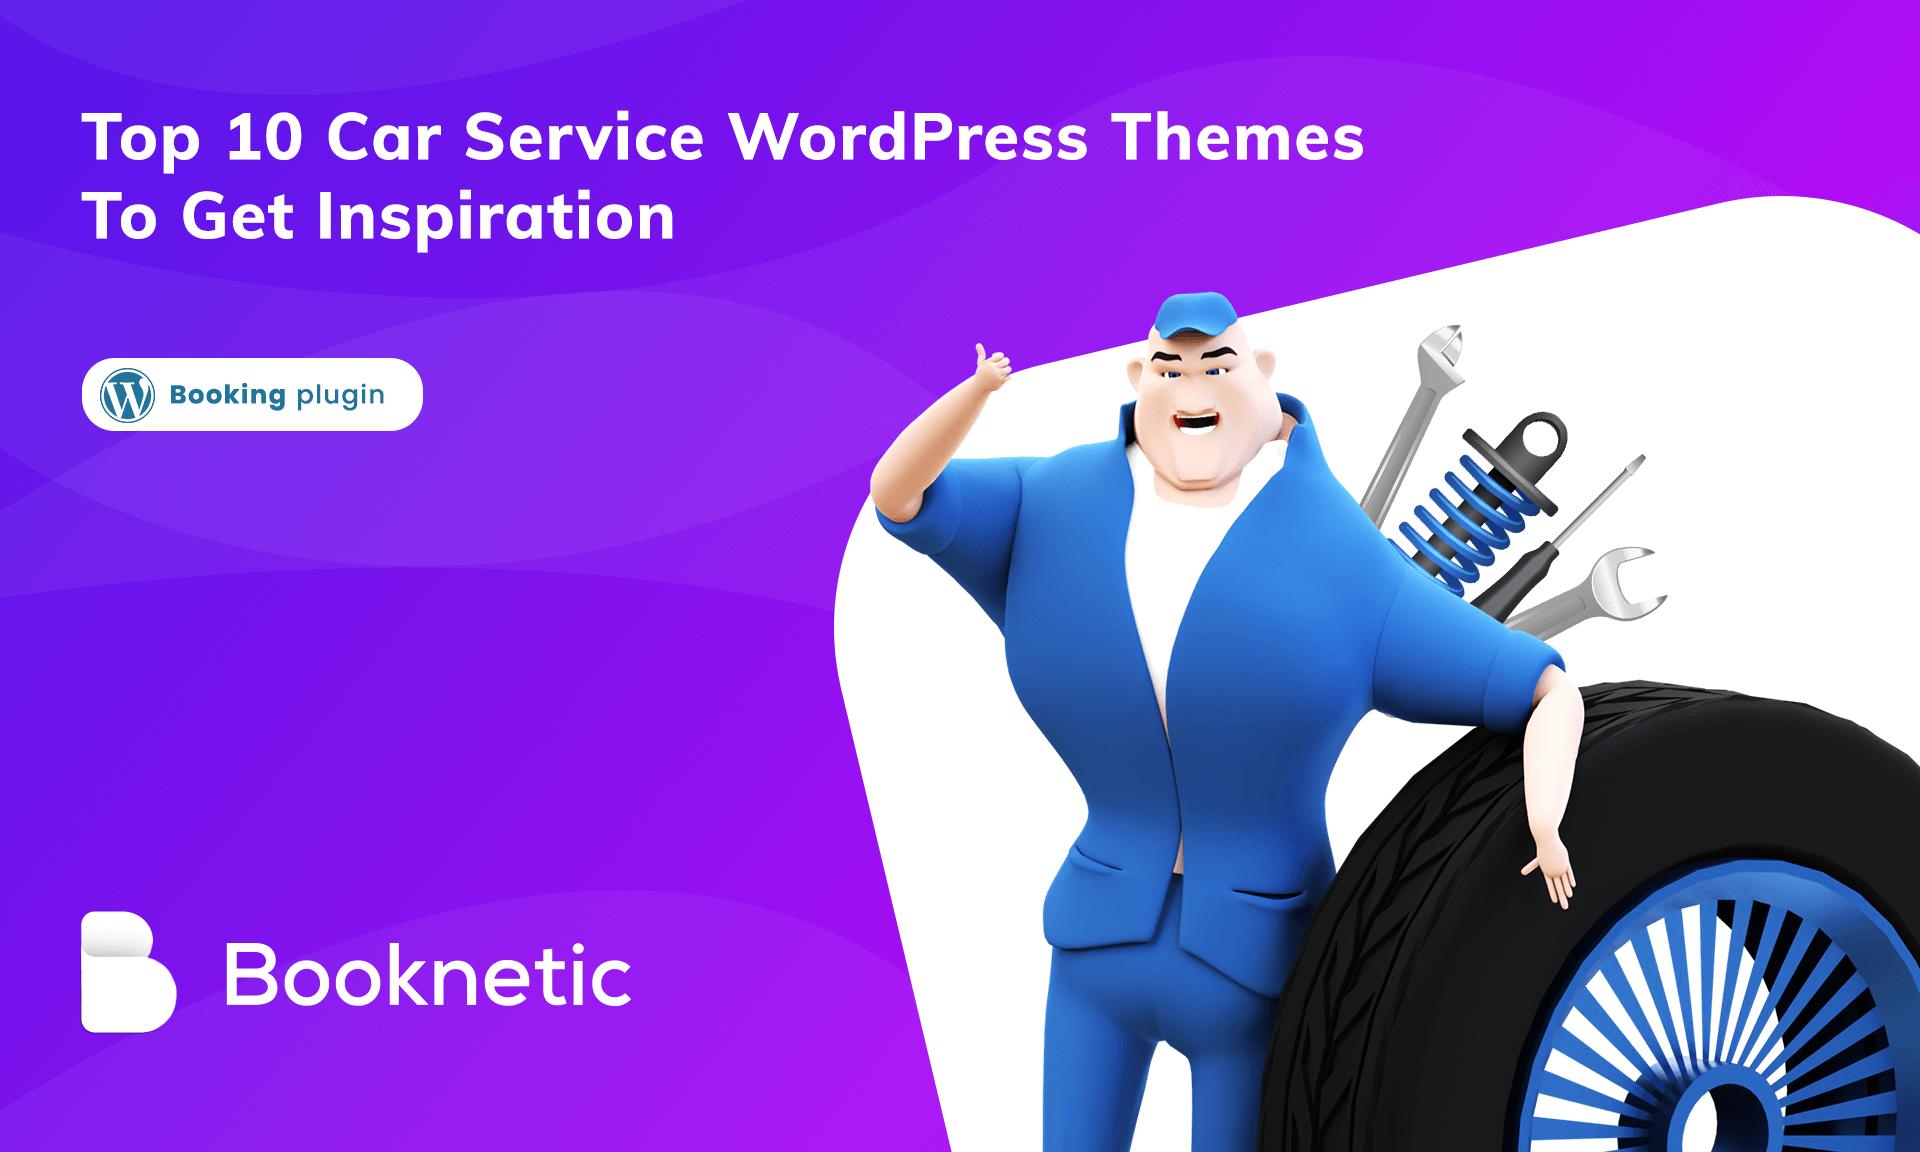 Top 10 car service wordpress themes to get inspiration